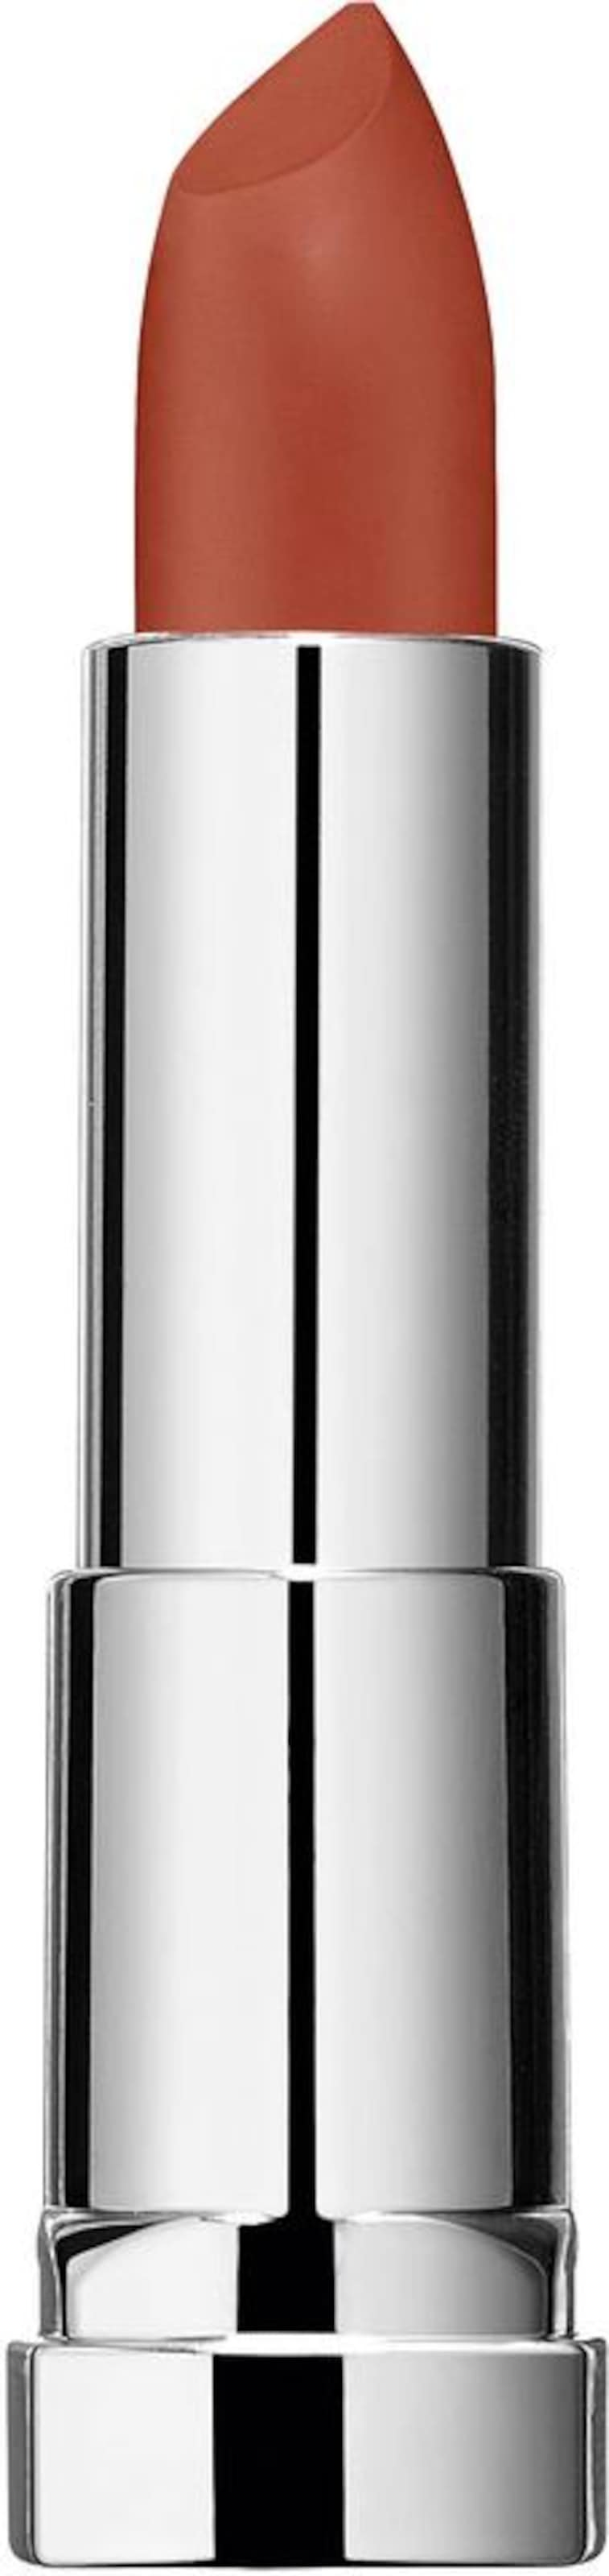 MAYBELLINE New York 'Lippenstift Color Sensational Creamy Mattes', Lippenstift